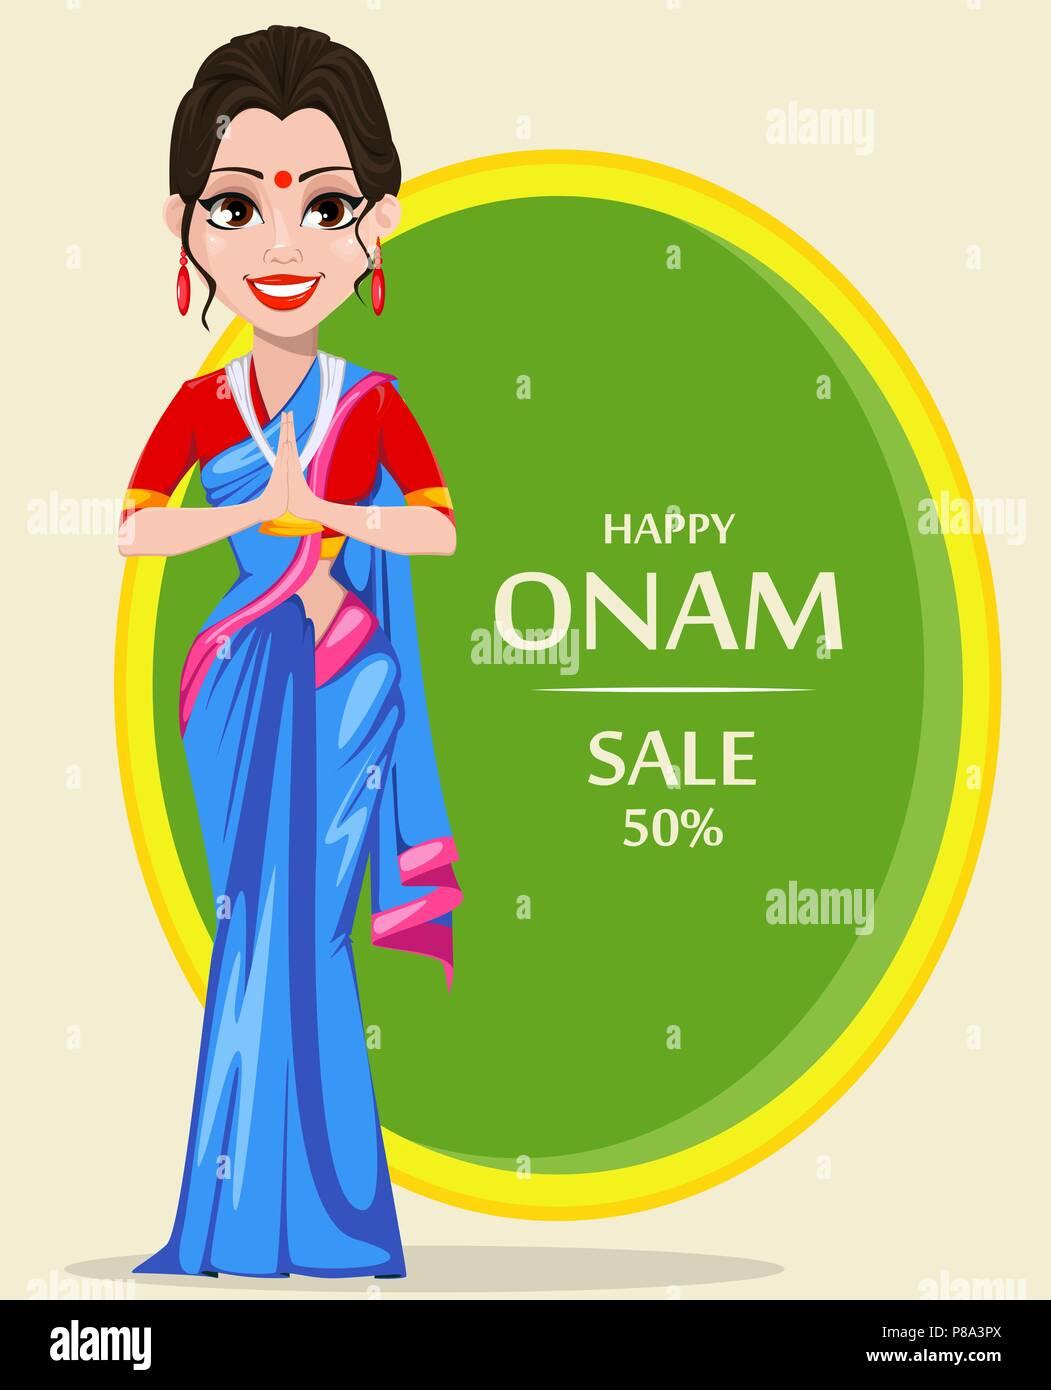 Onam Stock Vector Images Alamy